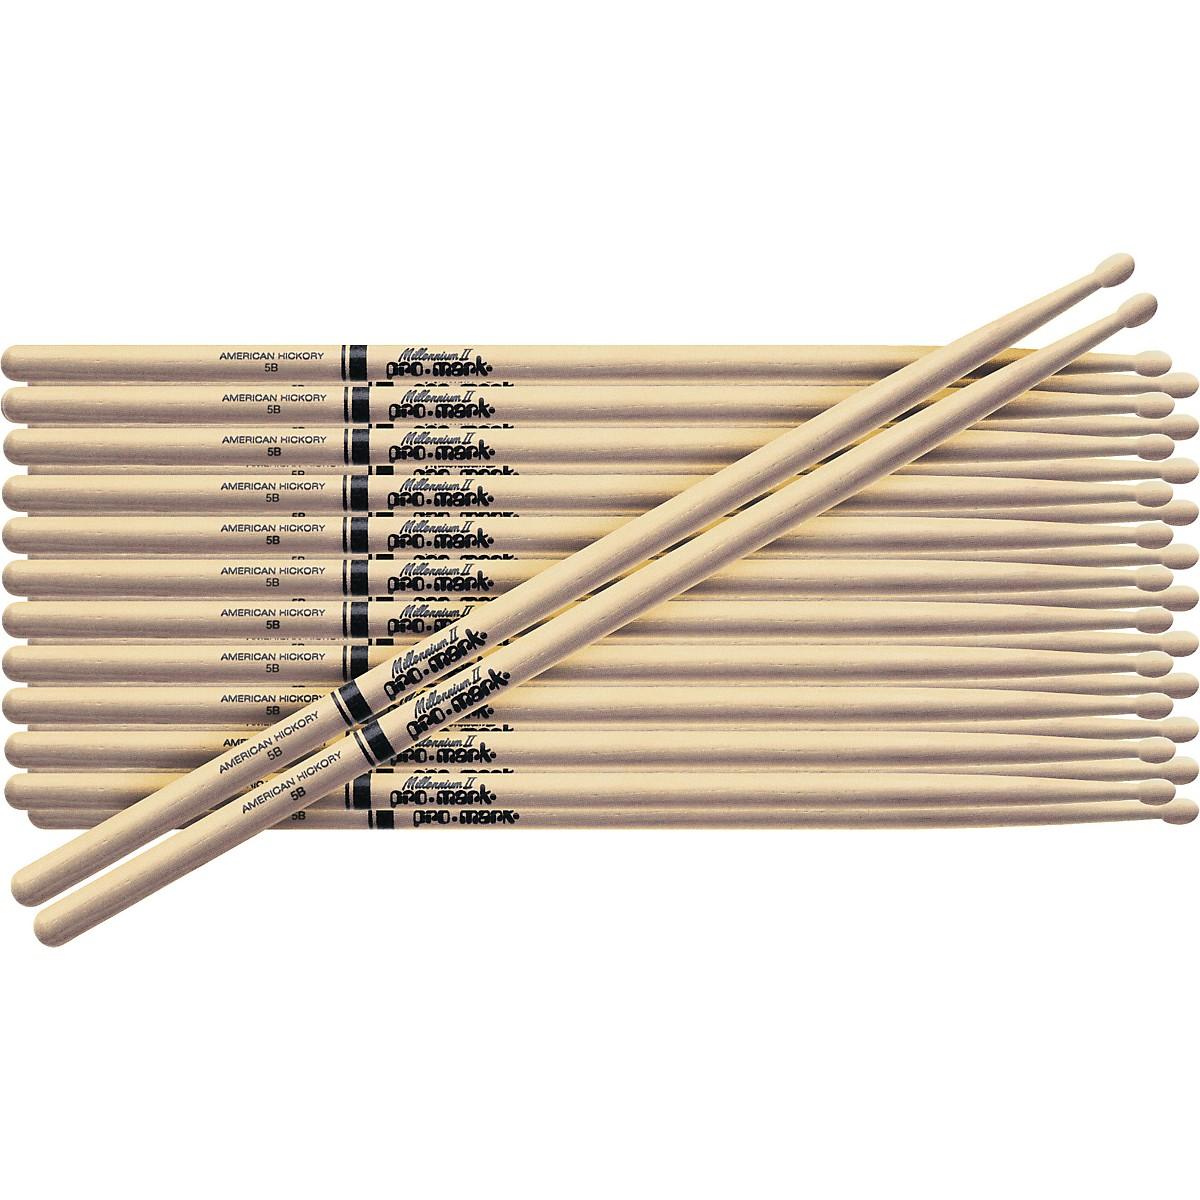 Promark 12-Pair American Hickory Drumsticks